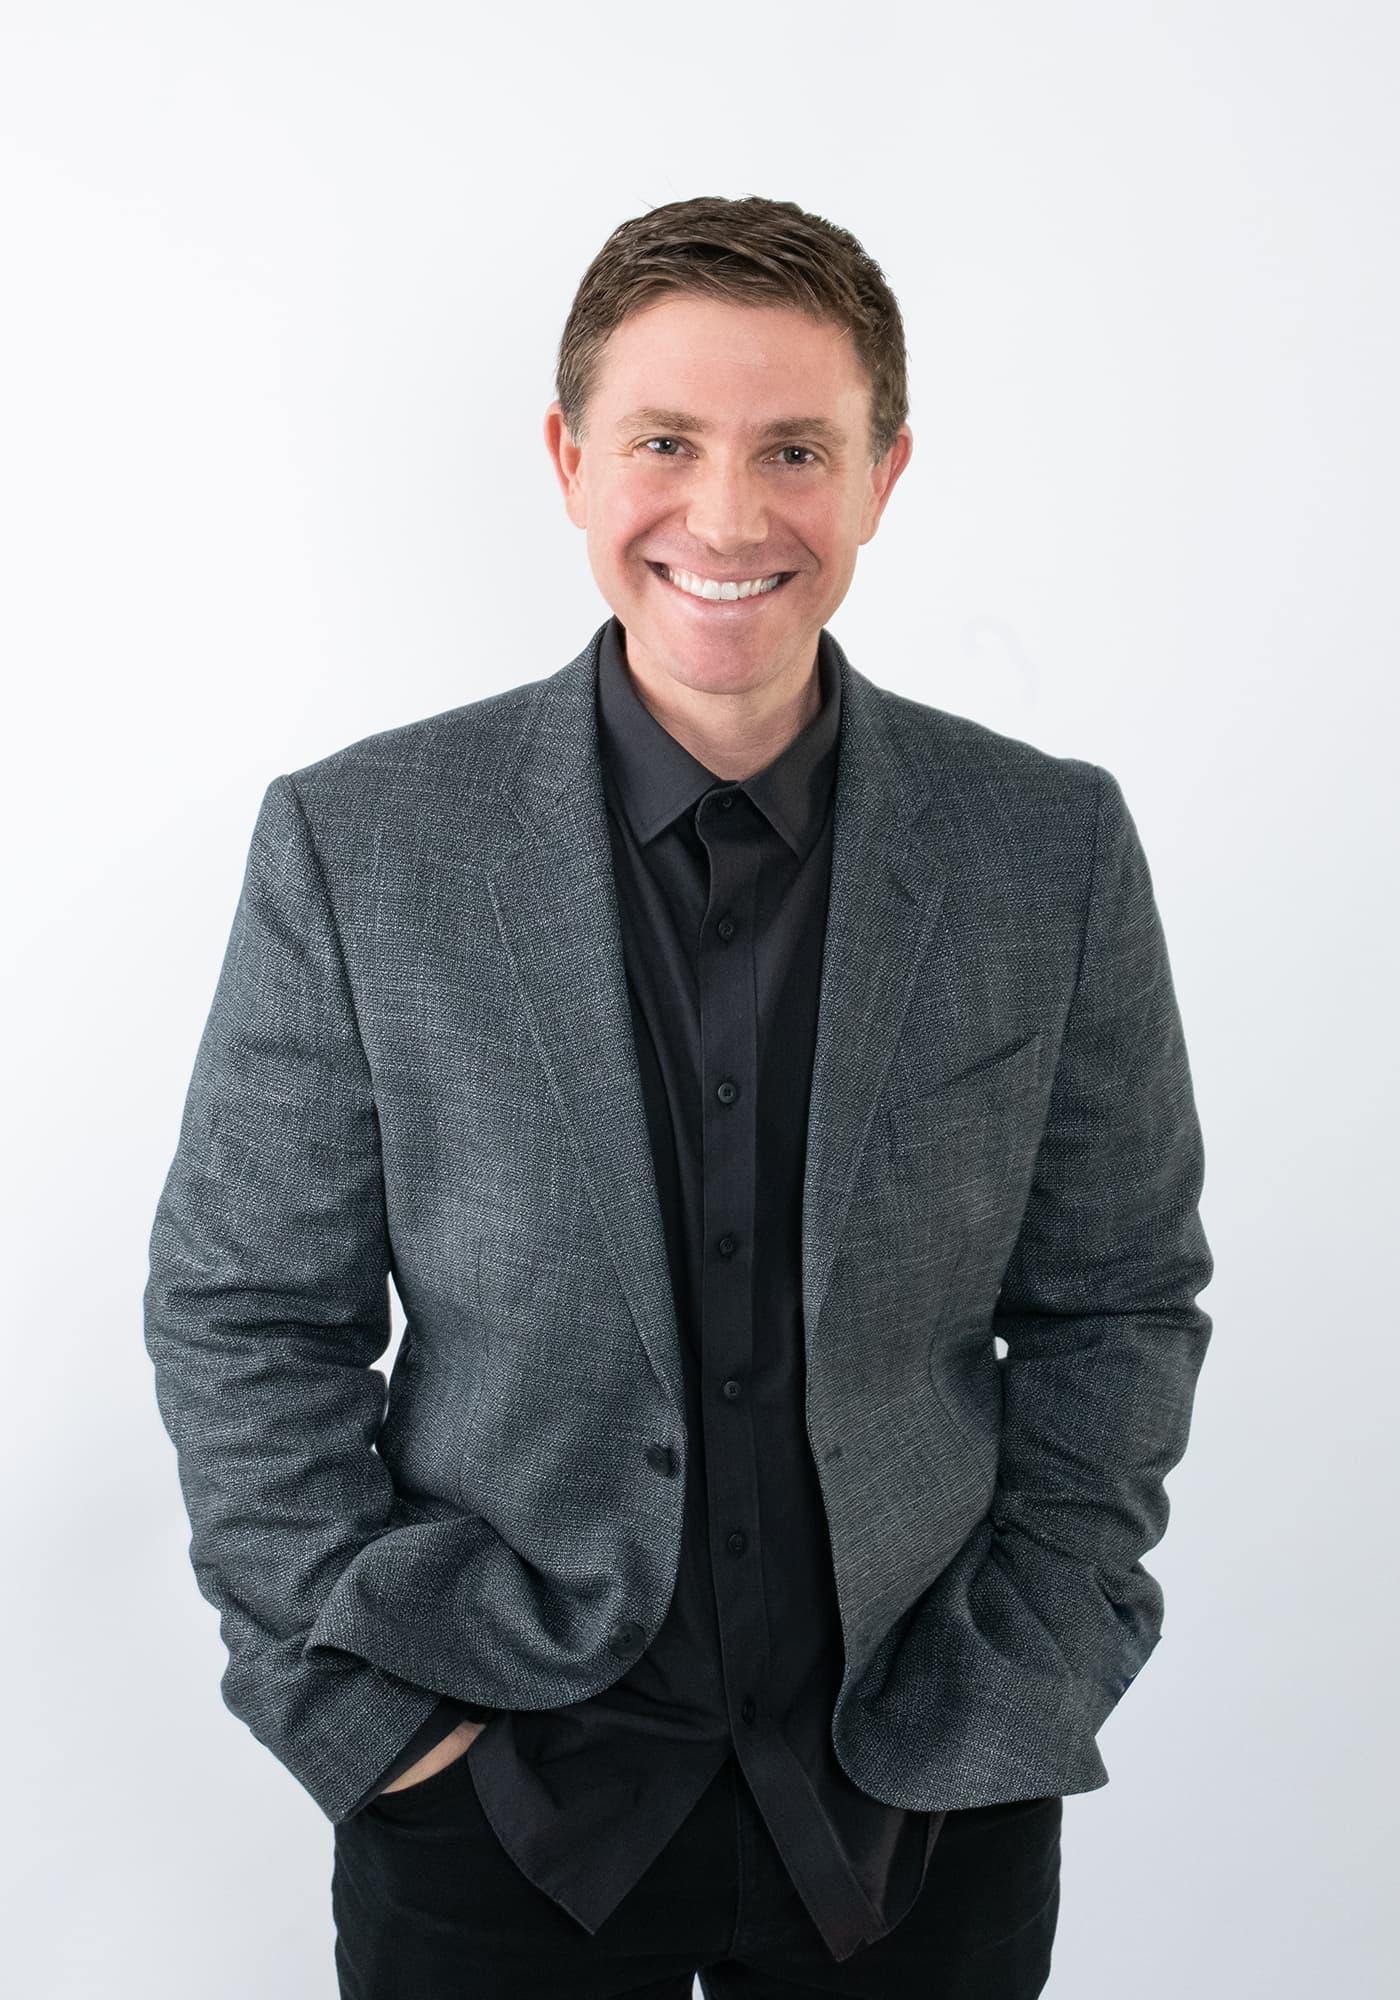 Bryan Passman